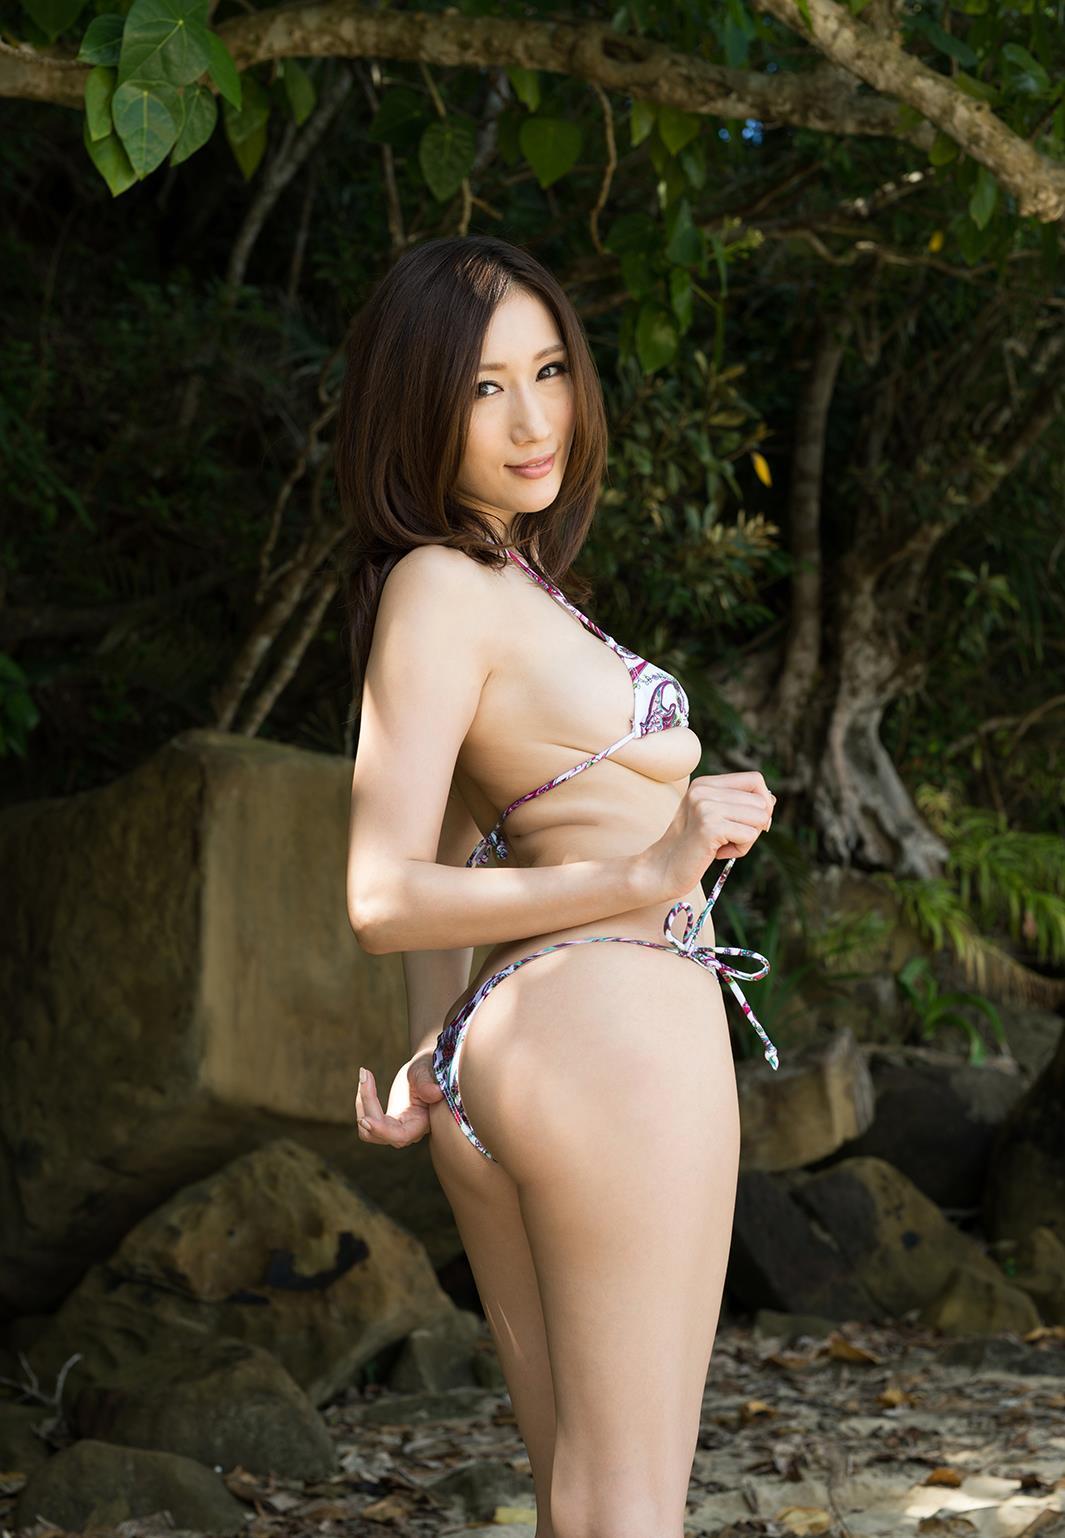 AV女優・JULIA(ジュリア) ヌード画像 49